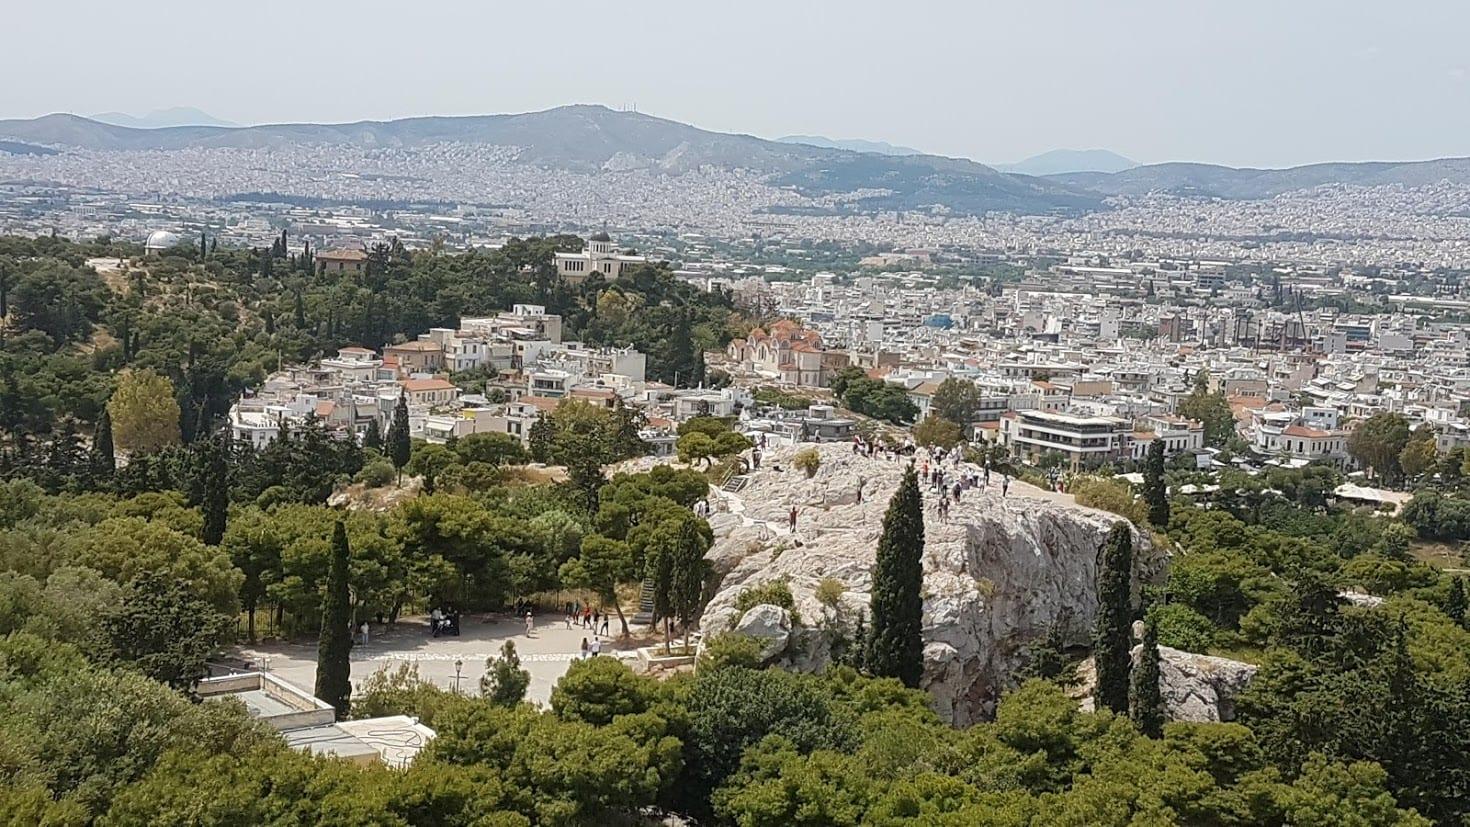 Areios Pagos underneath the Acropolis in Athens Greece